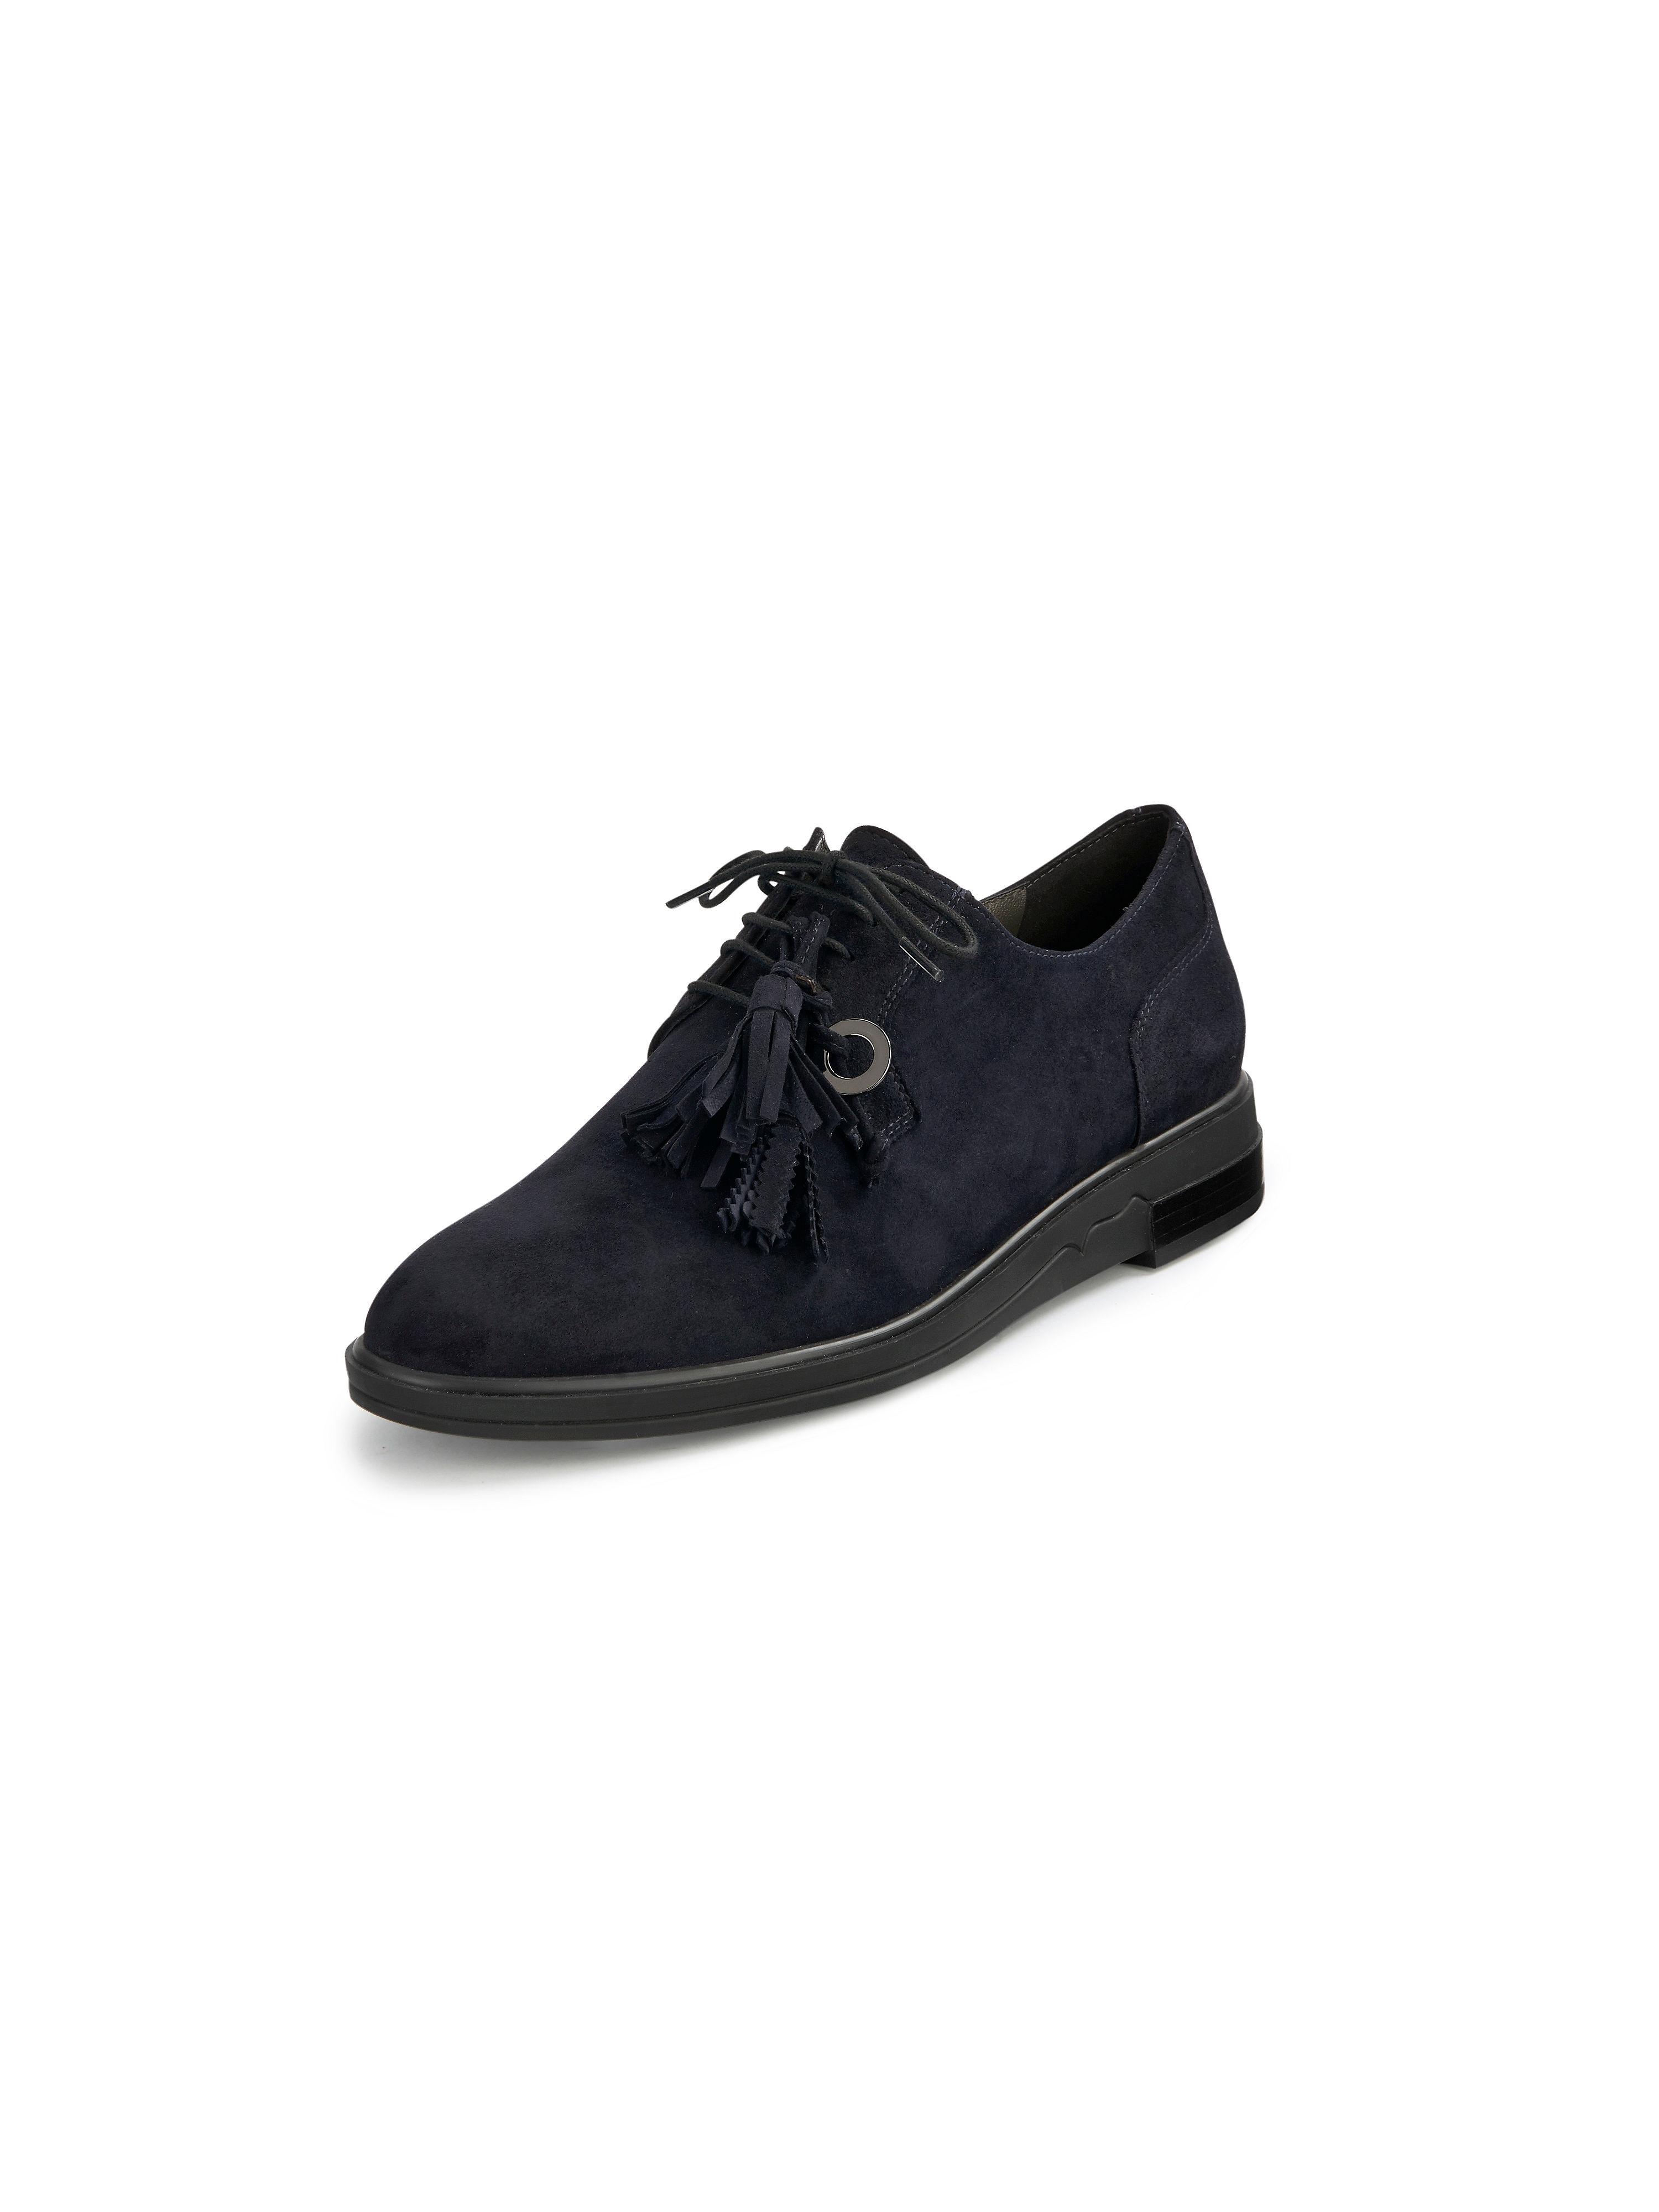 buy popular 6dcba 680d0 Schuhe online günstig kaufen über shop24.at | shop24